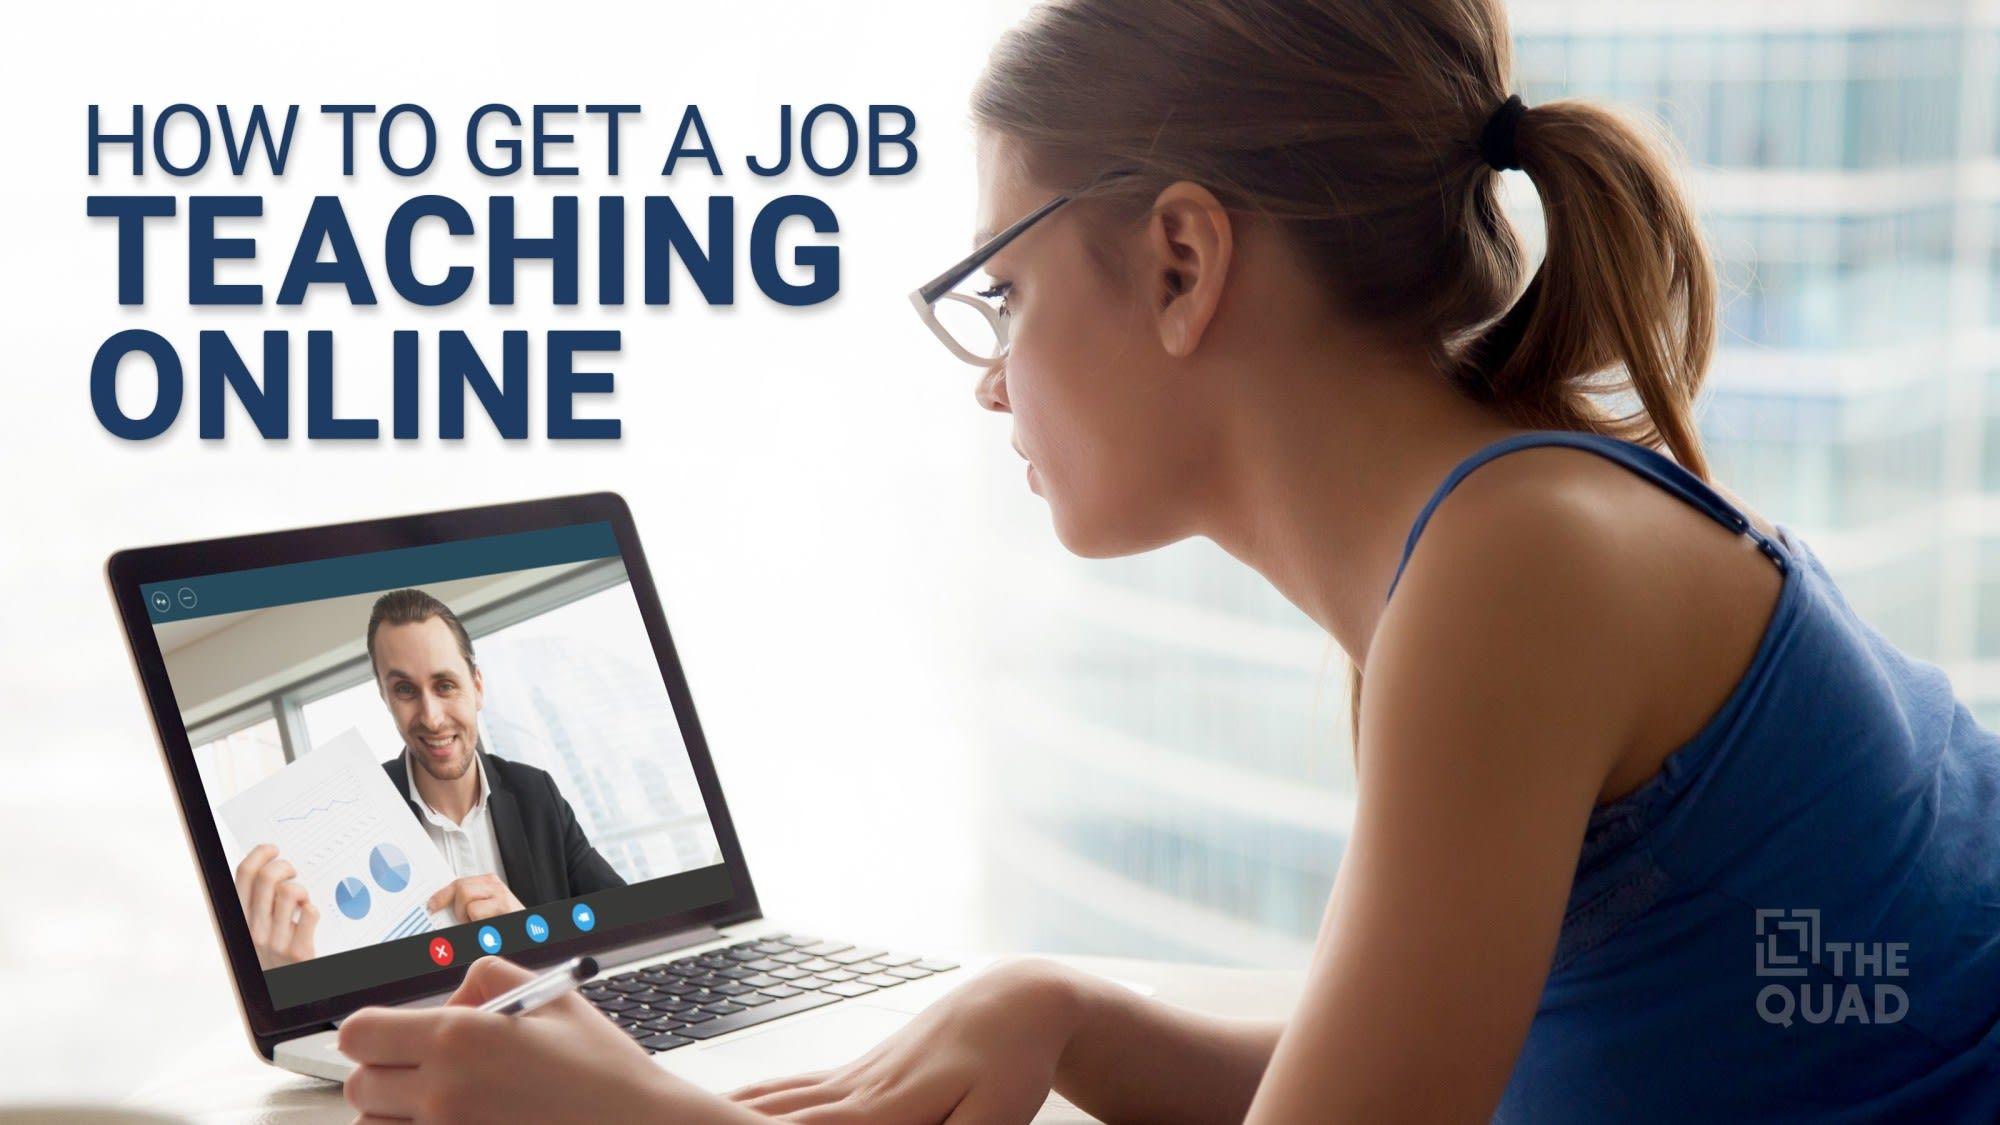 How To Get a Job Teaching Online   Online teaching, Online